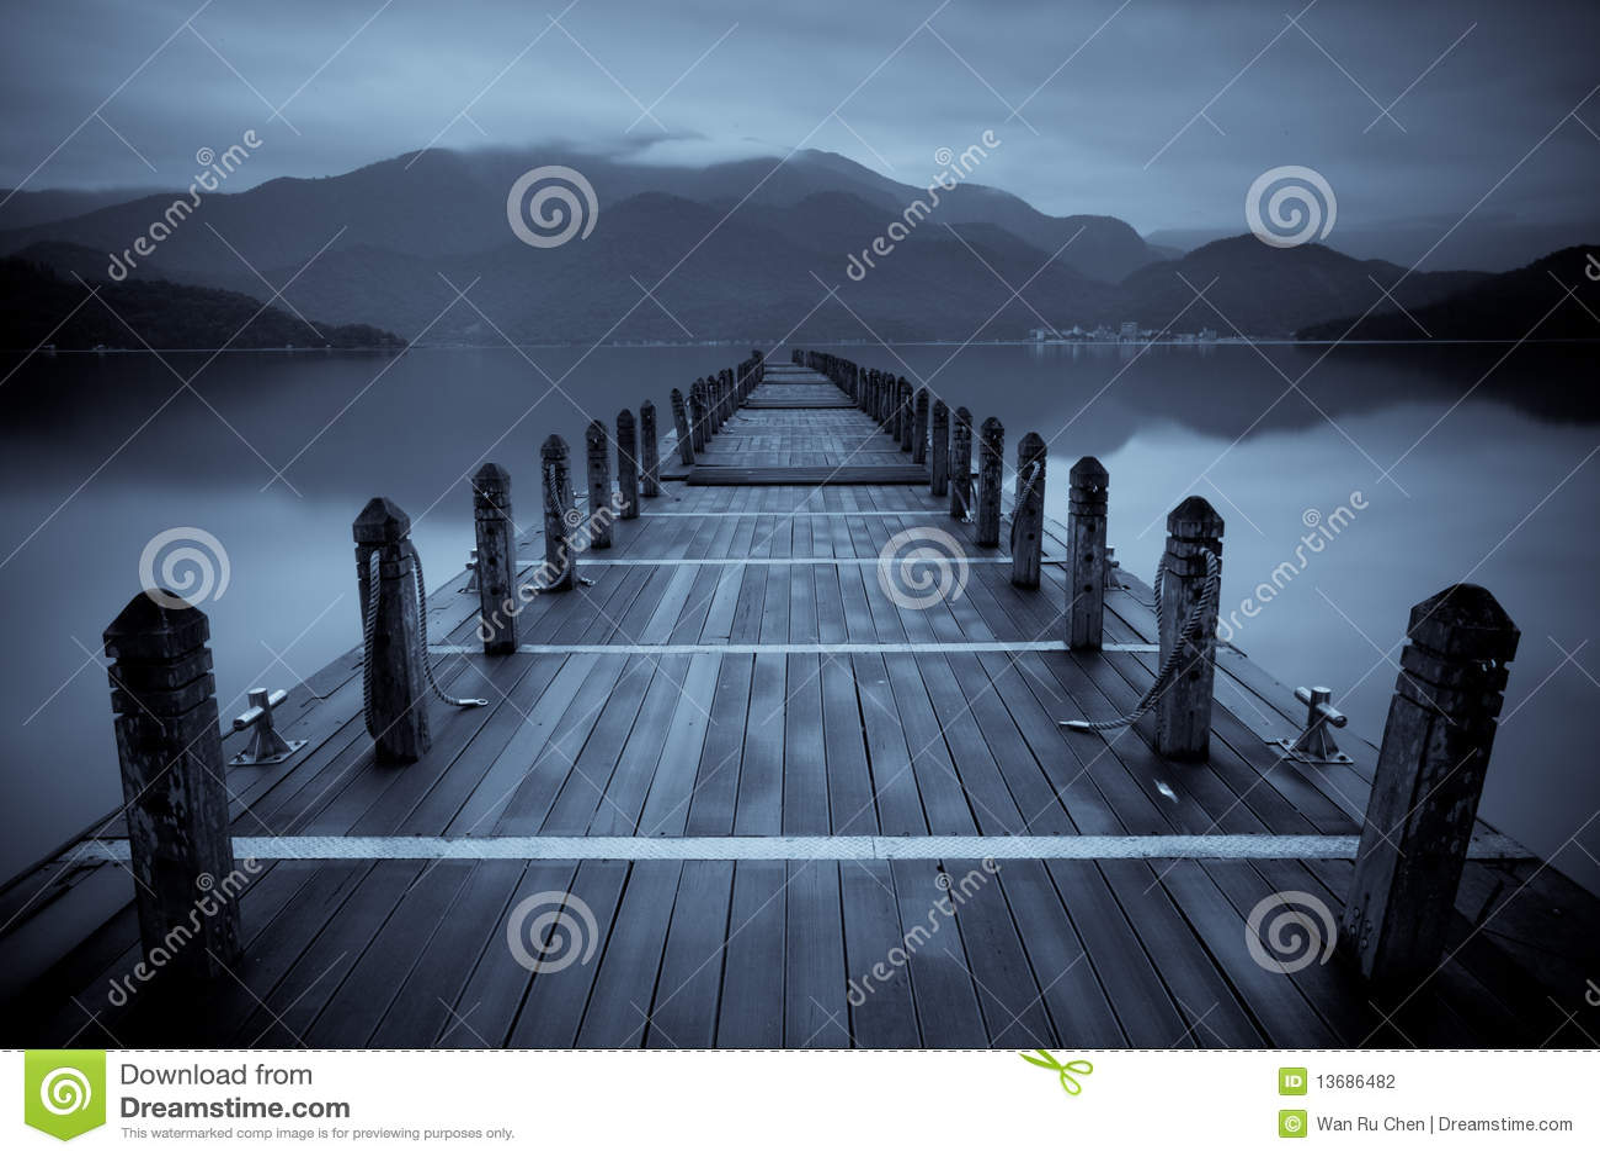 Endless mist lake